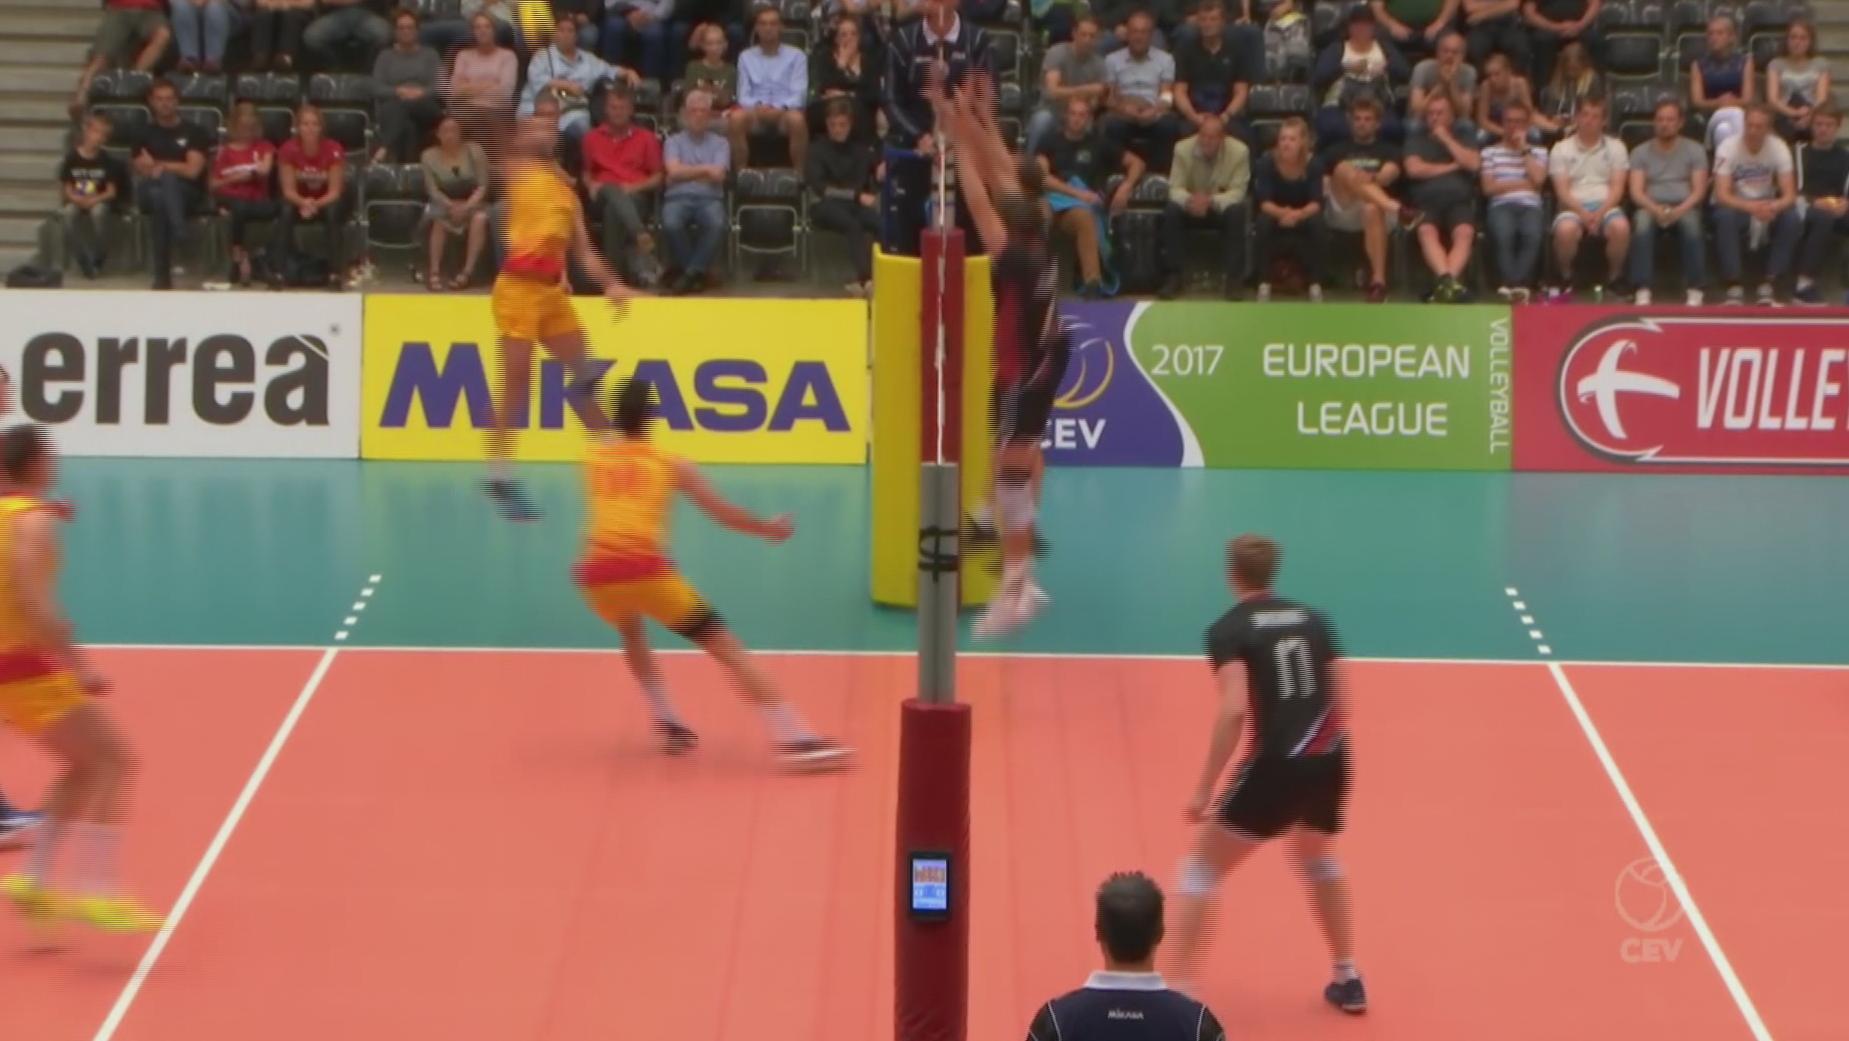 9392921_jena_volleyball_danmark_-_makedonien-20.31.37.18.jpeg